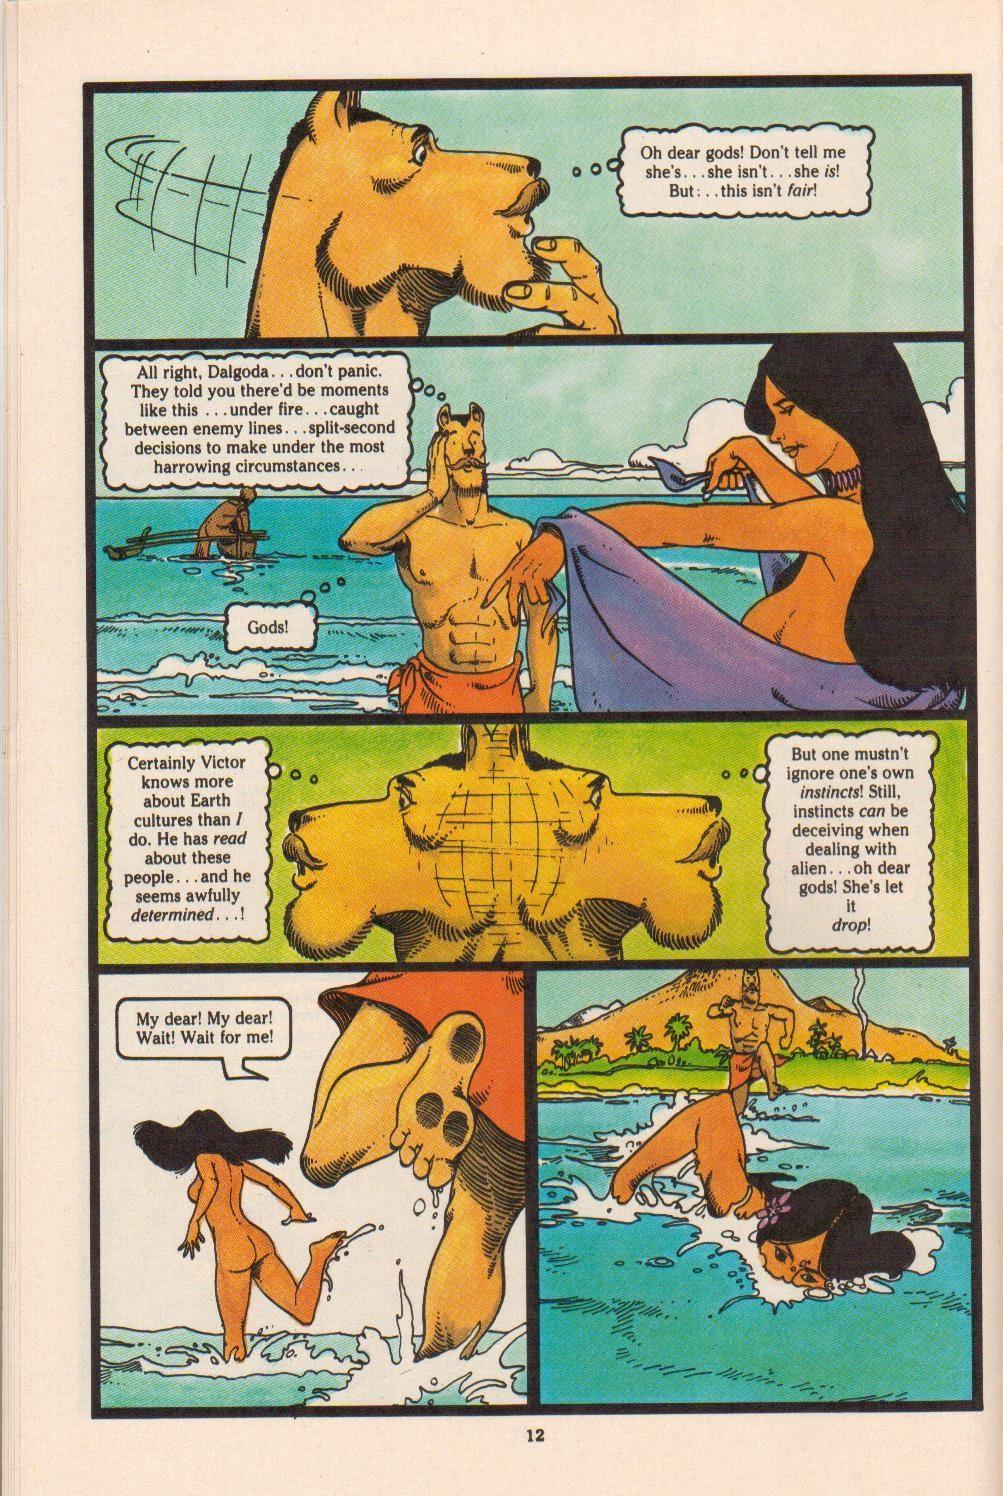 Read online Dalgoda comic -  Issue #4 - 14